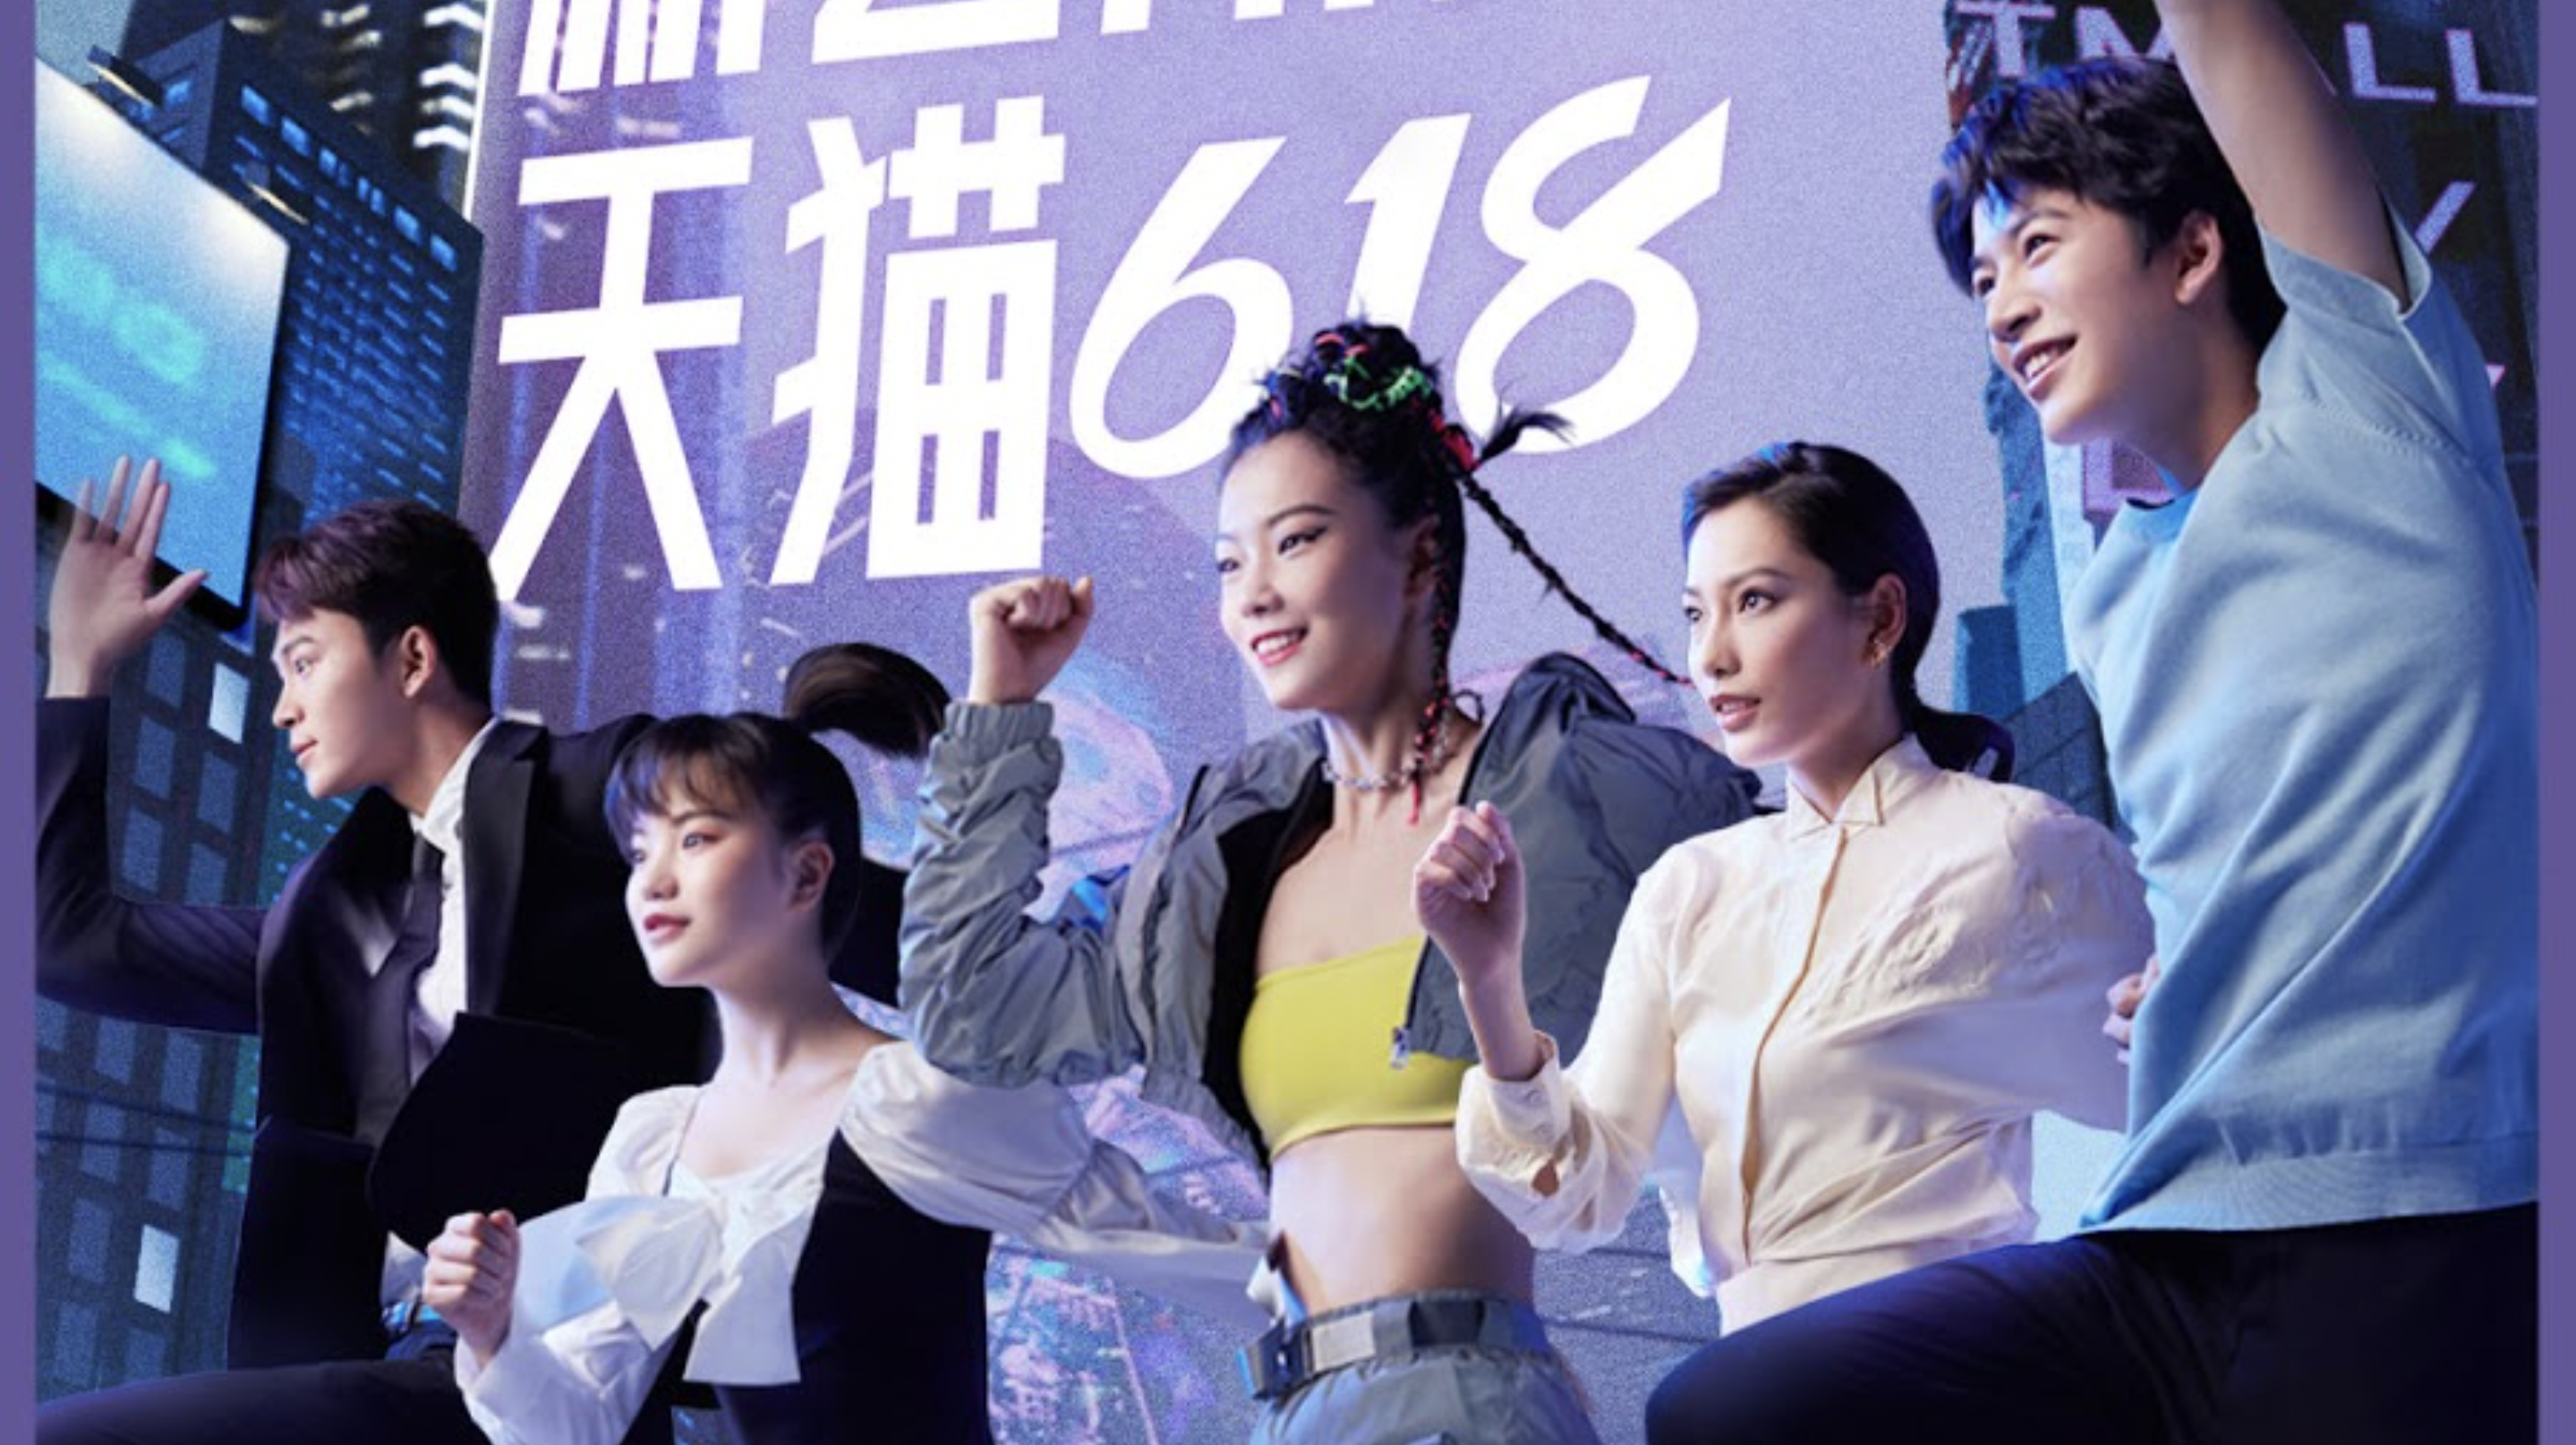 618 Shopping Festival 2021 Chine - Hylink France